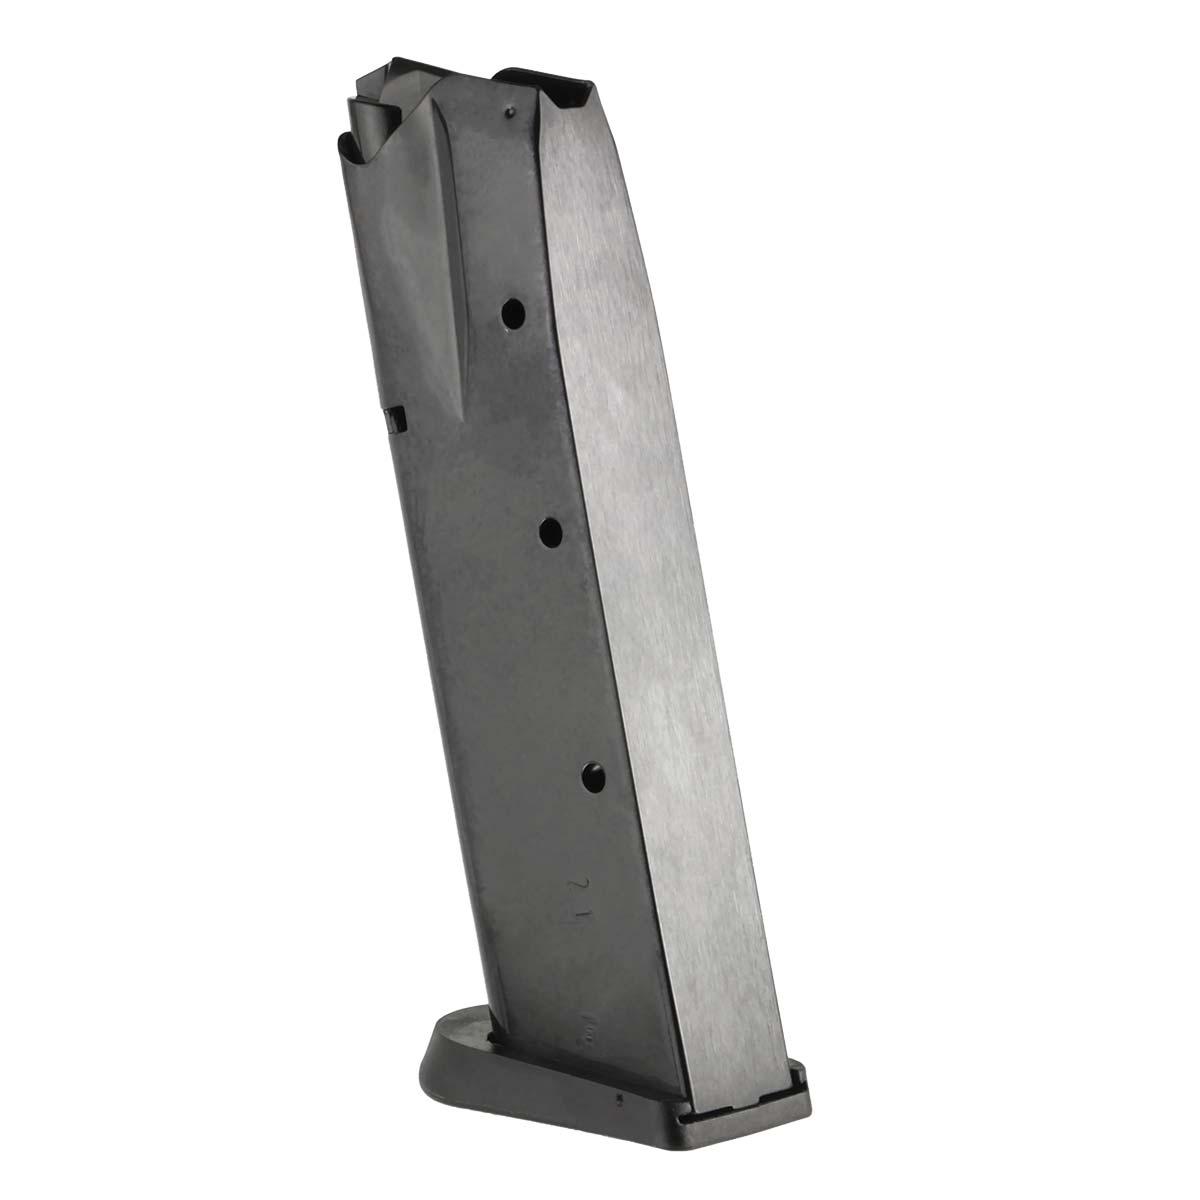 E-lander-9mm-9x19-Magazine-P--(10-Rounds)-2-